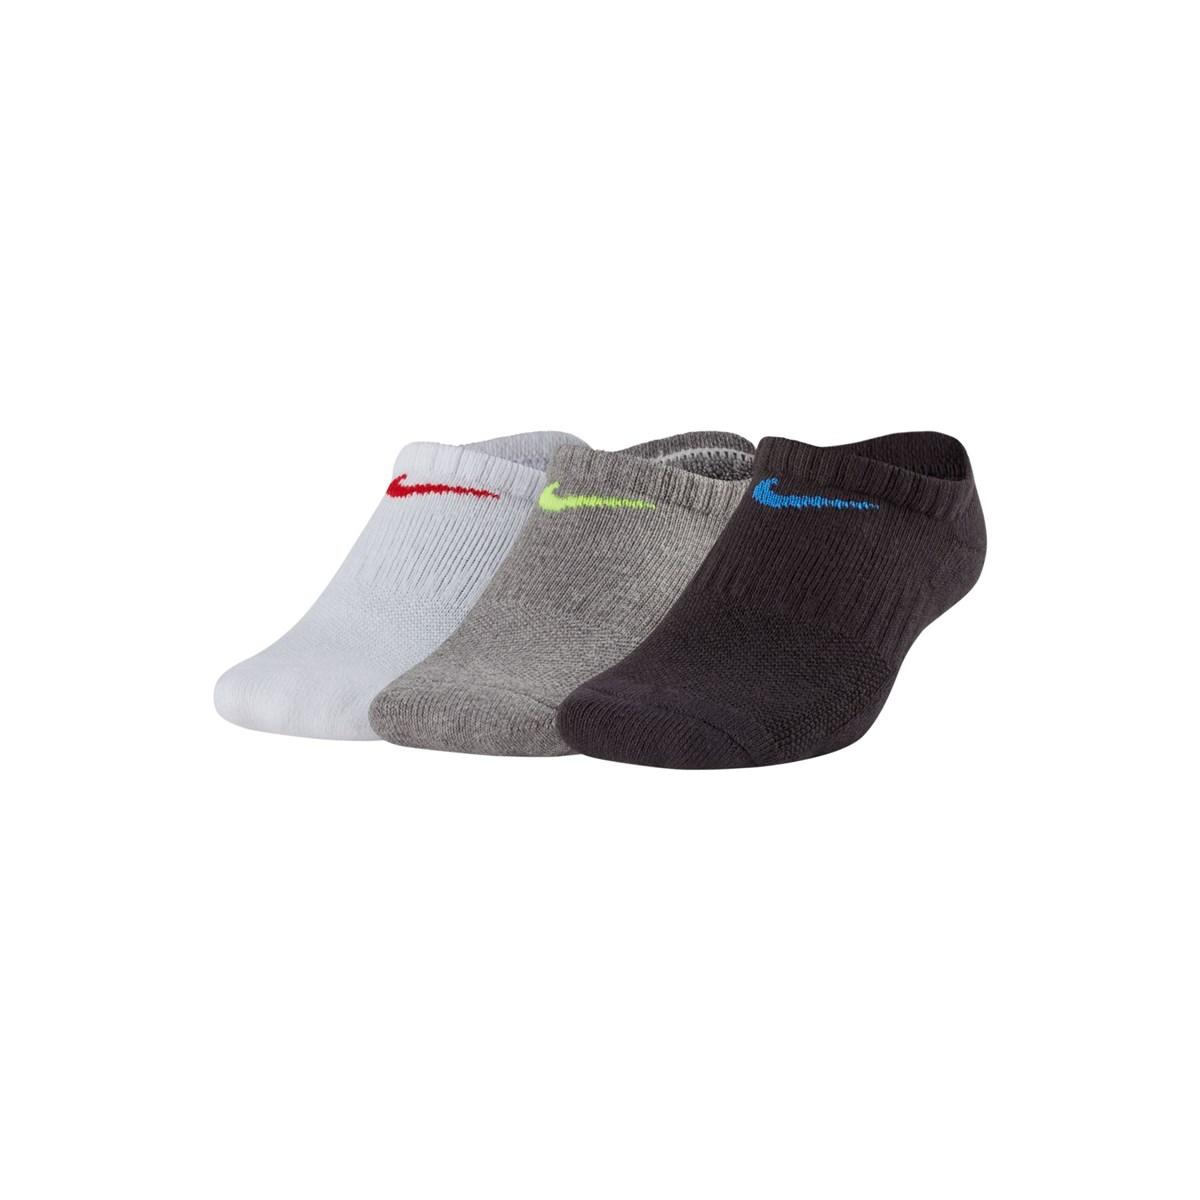 Everyday Cushioned 3'lü Spor Bilek Çorap (SX6843-906)